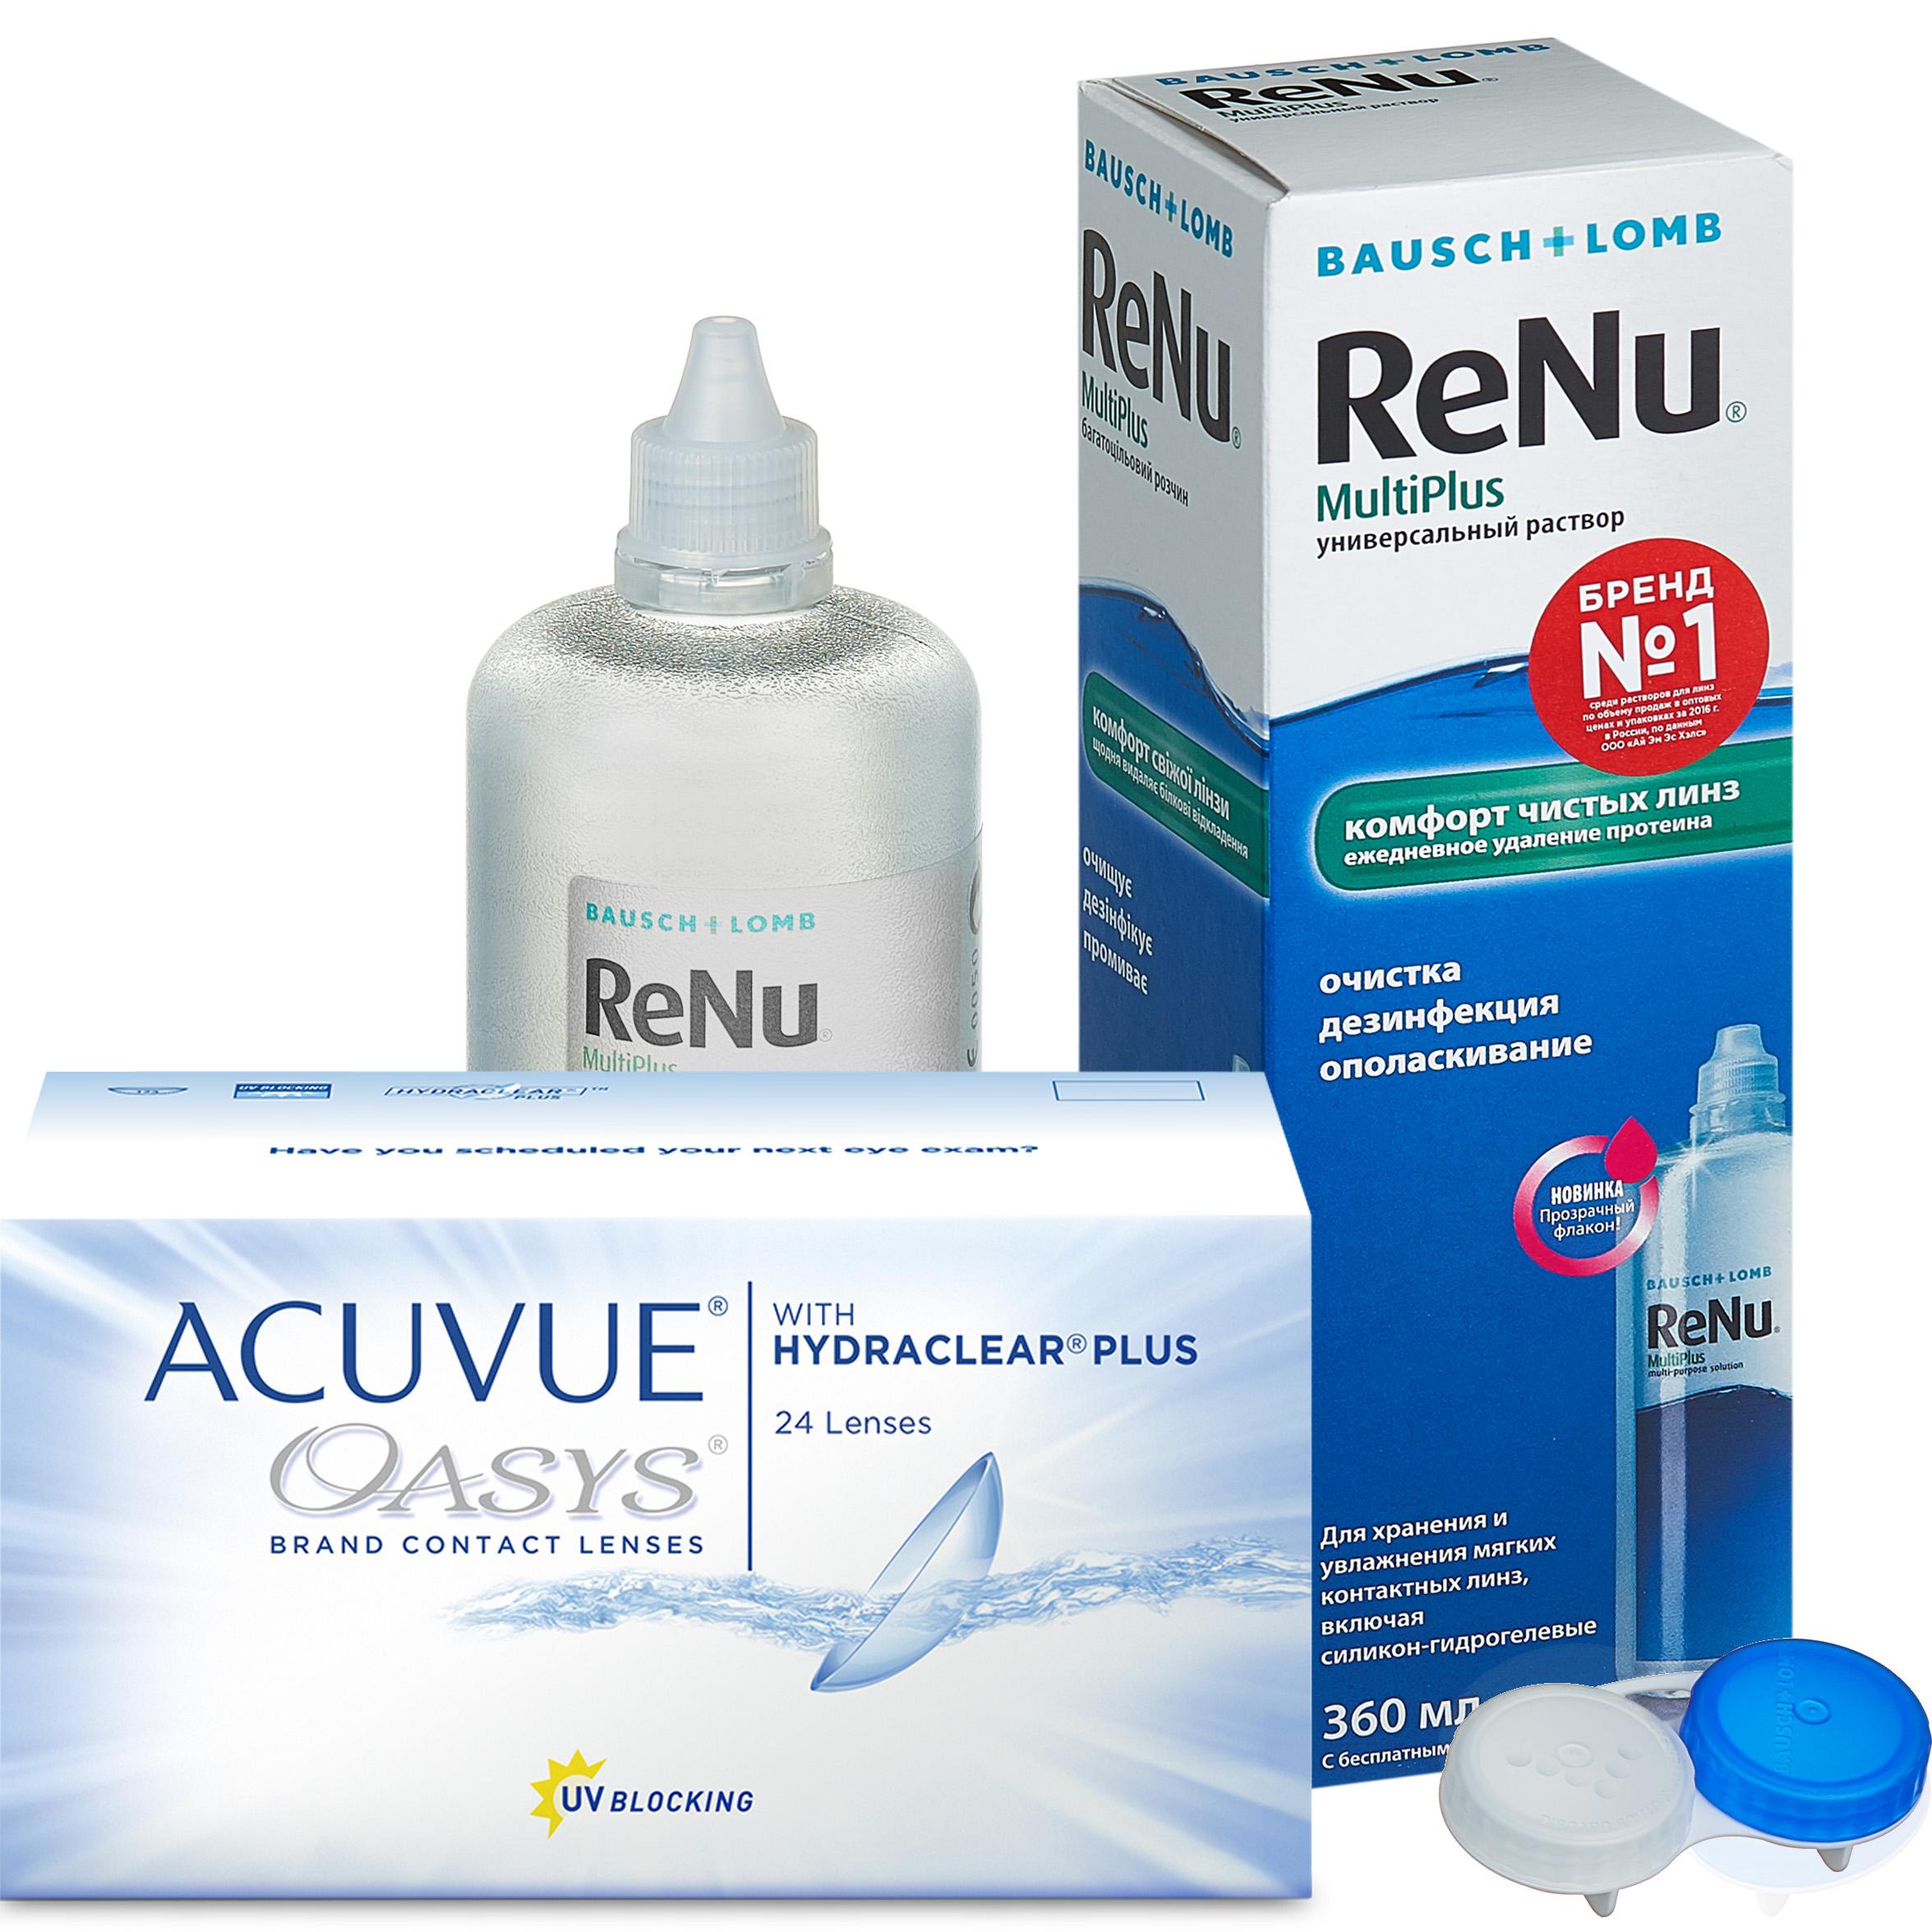 Купить Oasys with Hydraclear Plus 24 линзы + ReNu MultiPlus, Линзы Acuvue Oasys with Hydraclear Plus 24 линзы R 8.8 -11, 00 + ReNu Multi Plus 360 мл